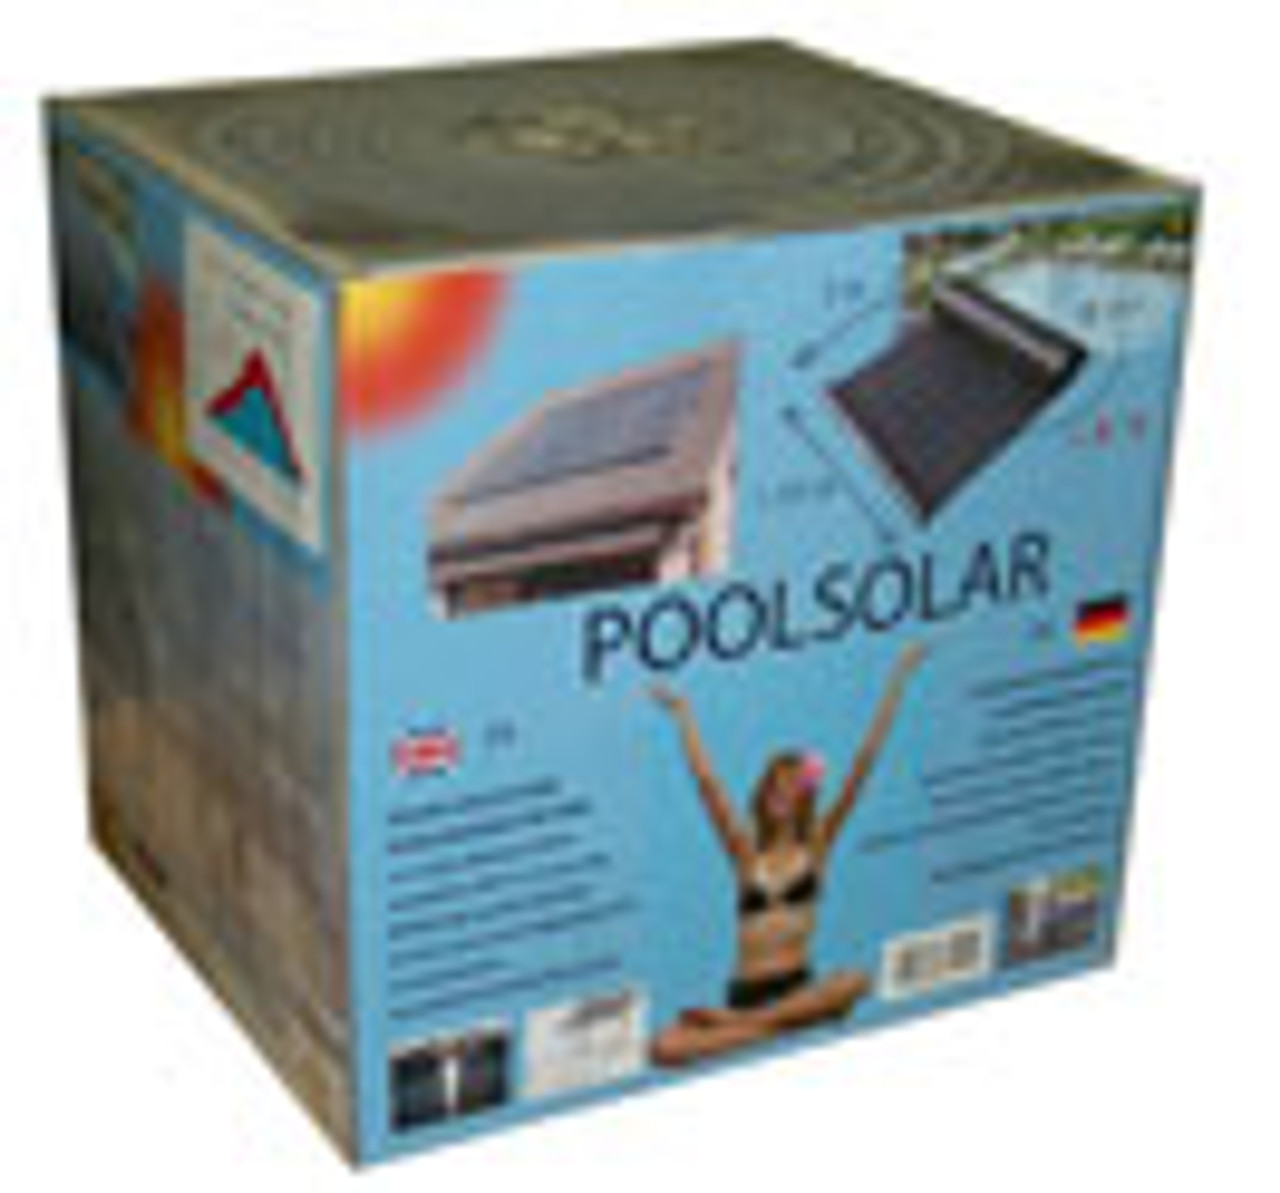 Poolsolar boxed